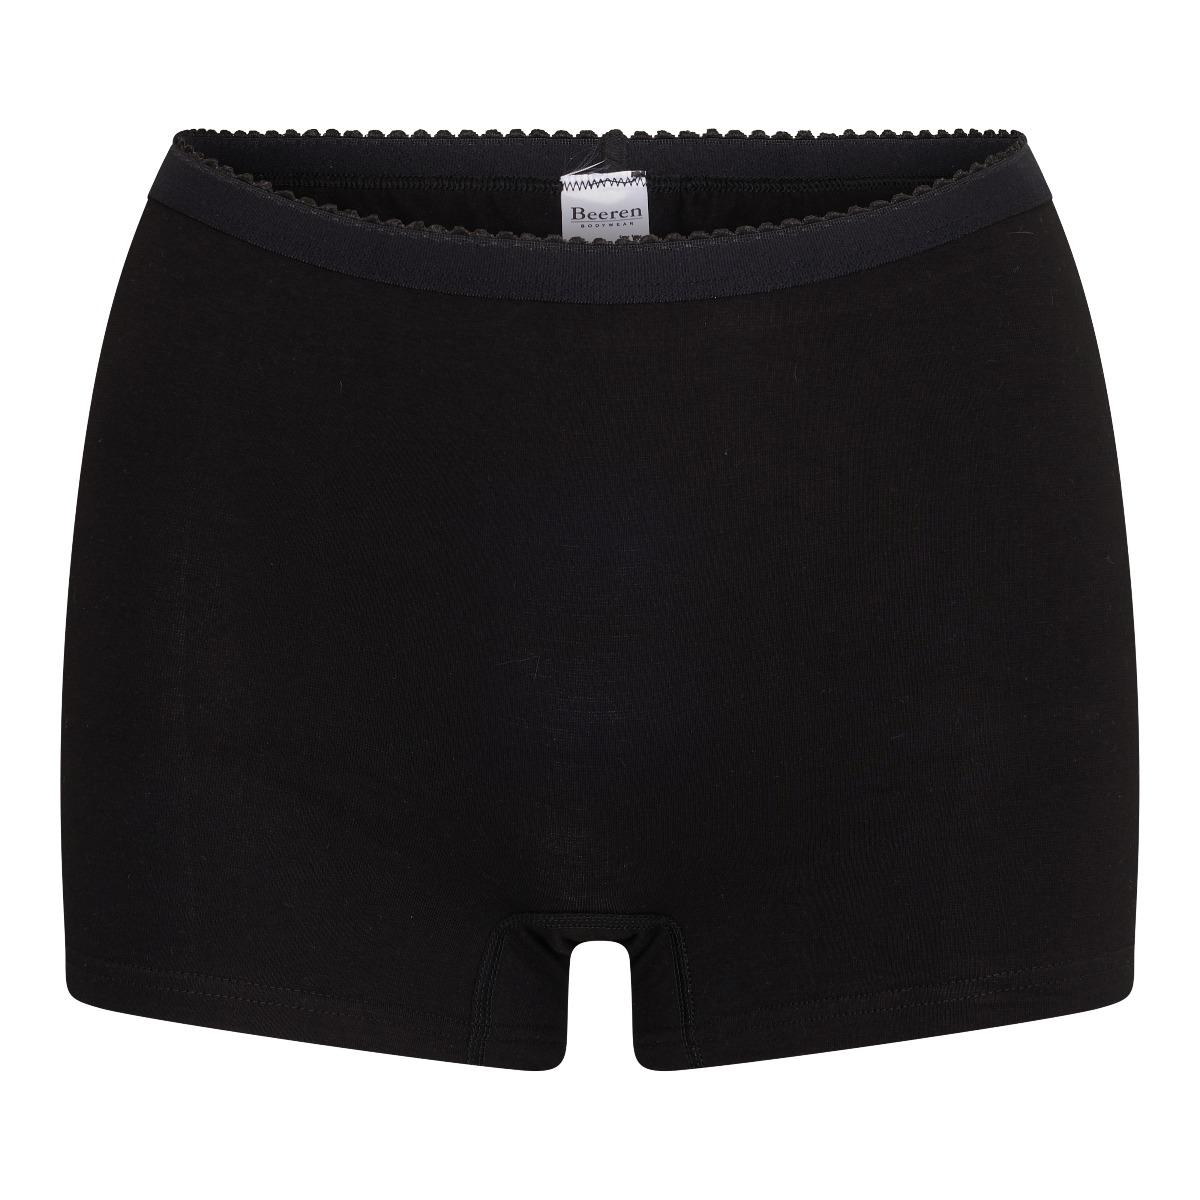 Beeren Softly Dames Panty Zwart L